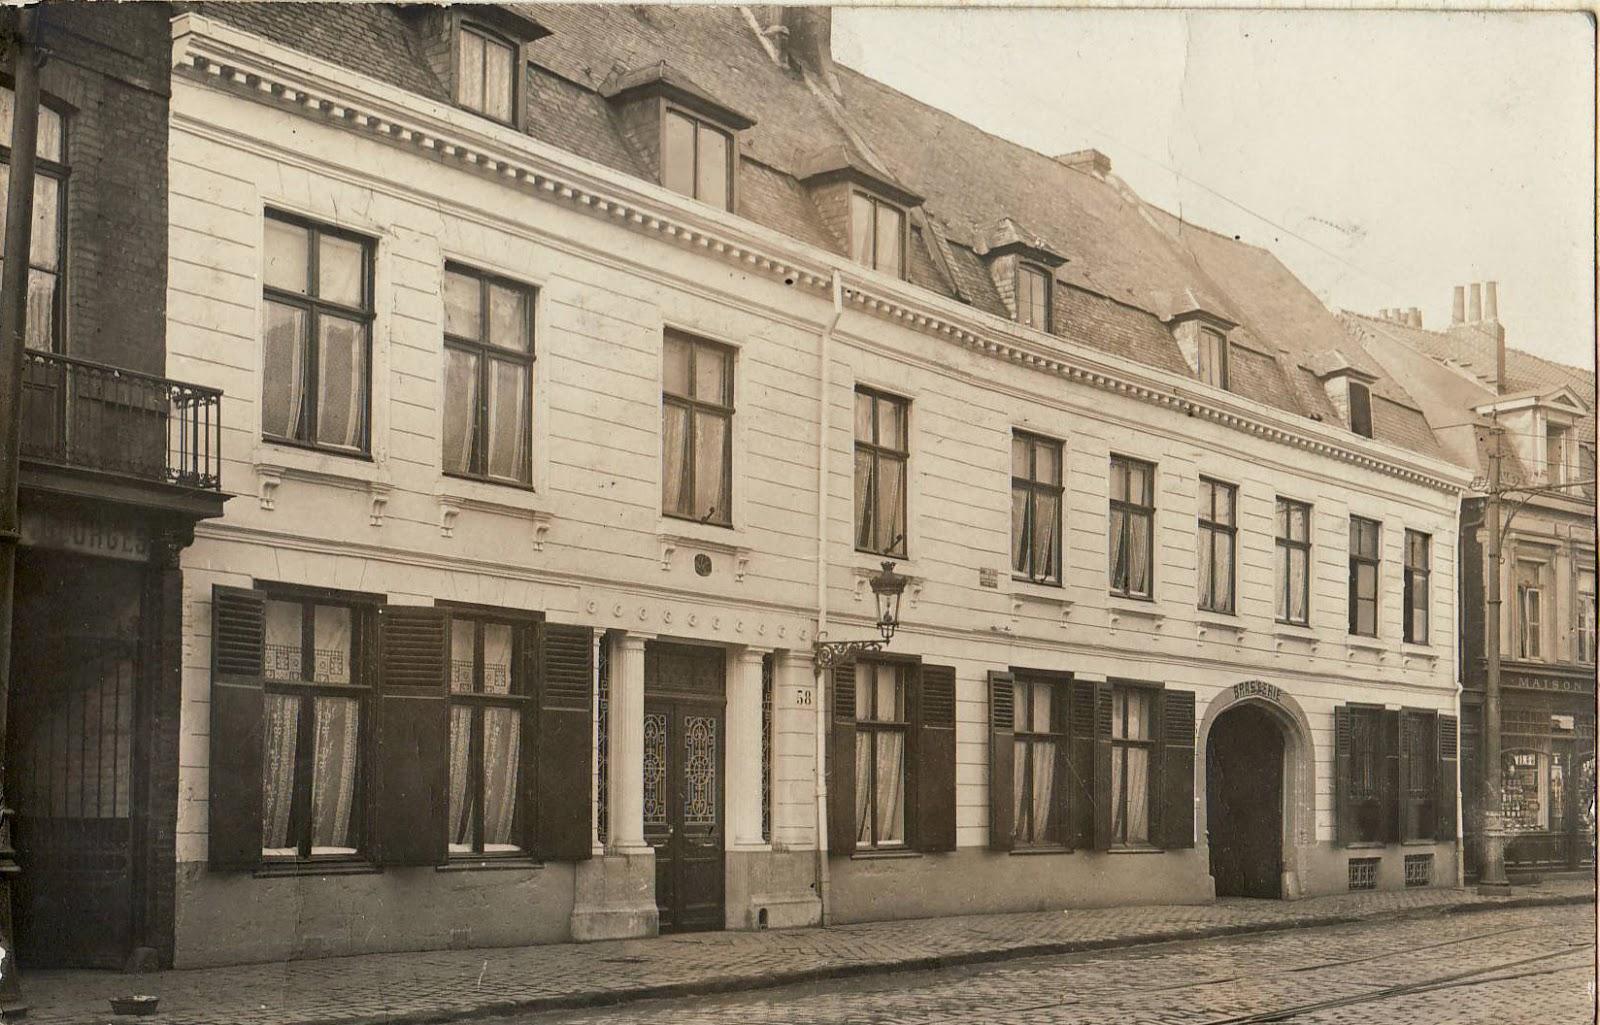 Histoires et familles du nord for 82 rue brule maison lille